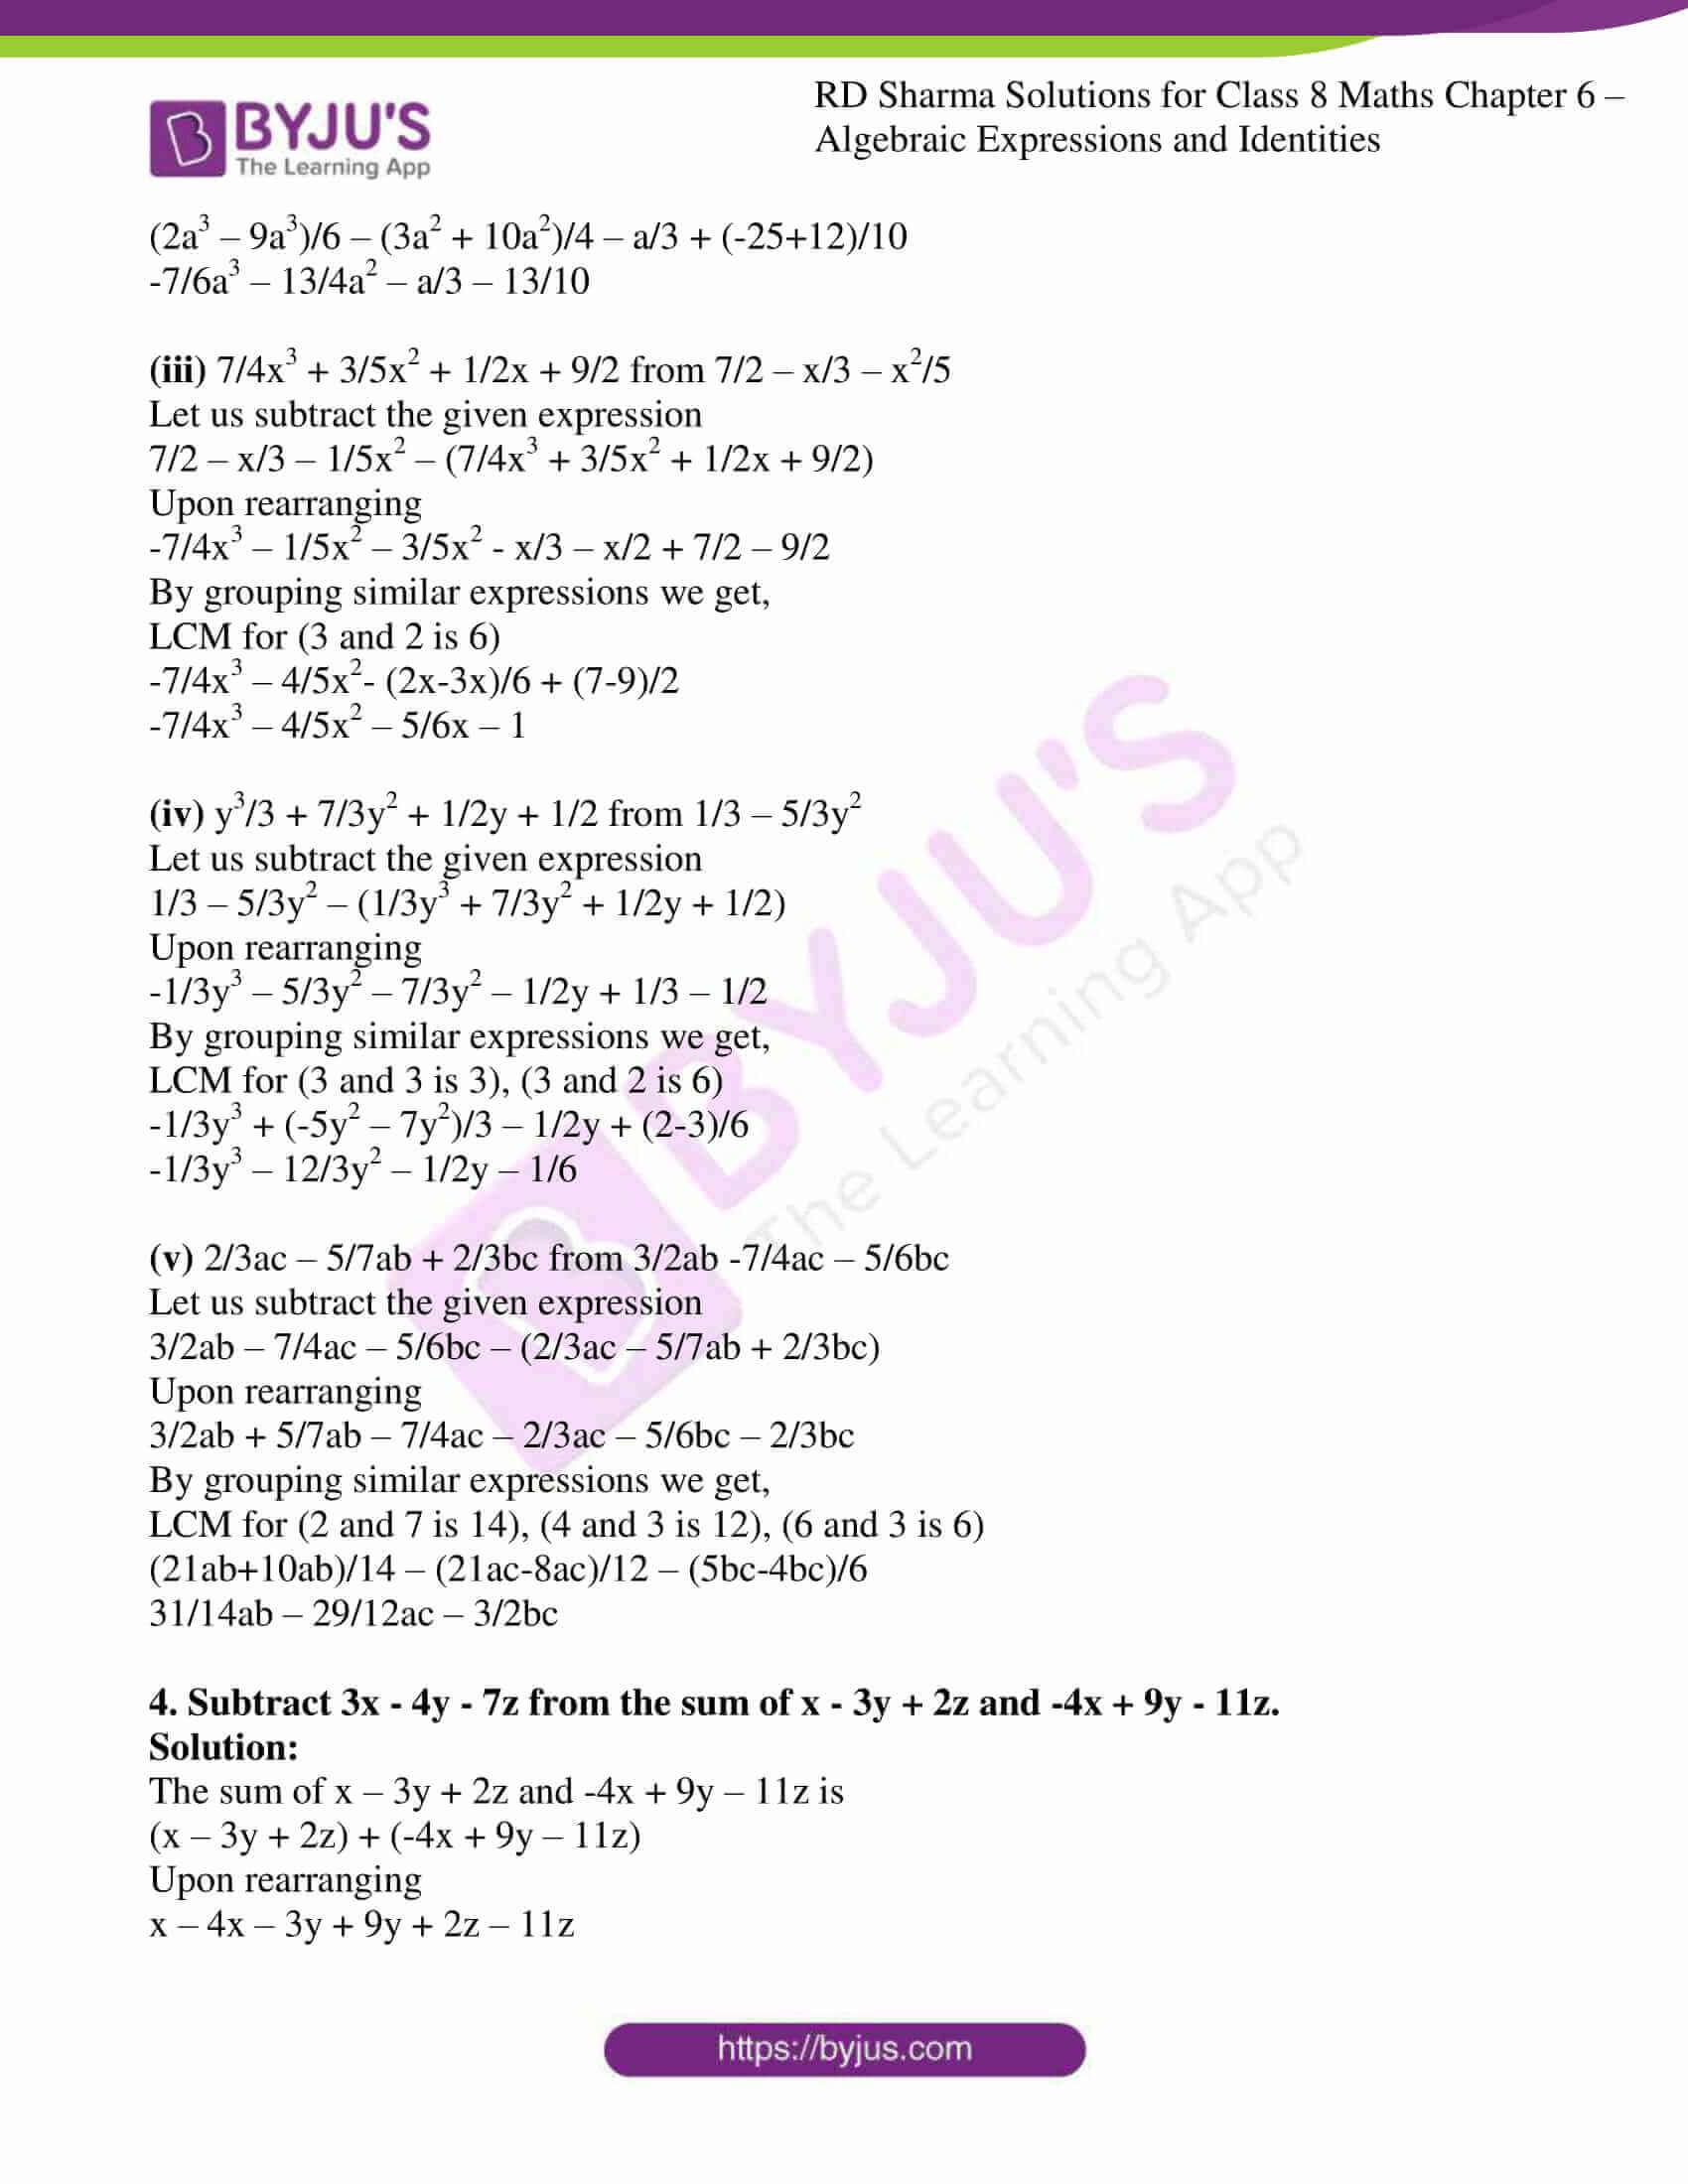 rd sharma class 8 maths chapter 6 exercise 2 5